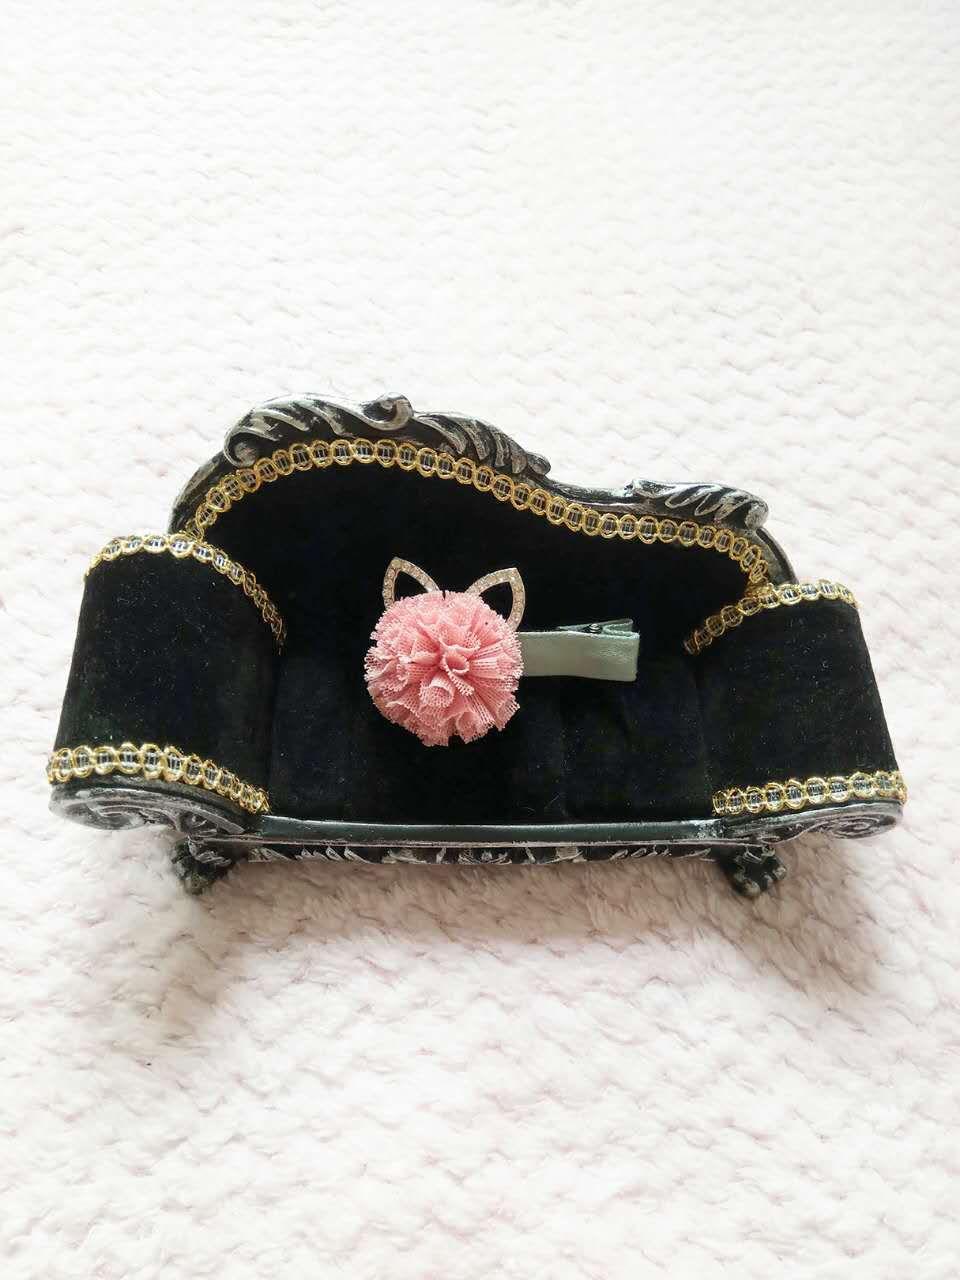 NEW kids diamond rabbit ear bud silk ball hair clips girls cartoon clips four colors shipping free